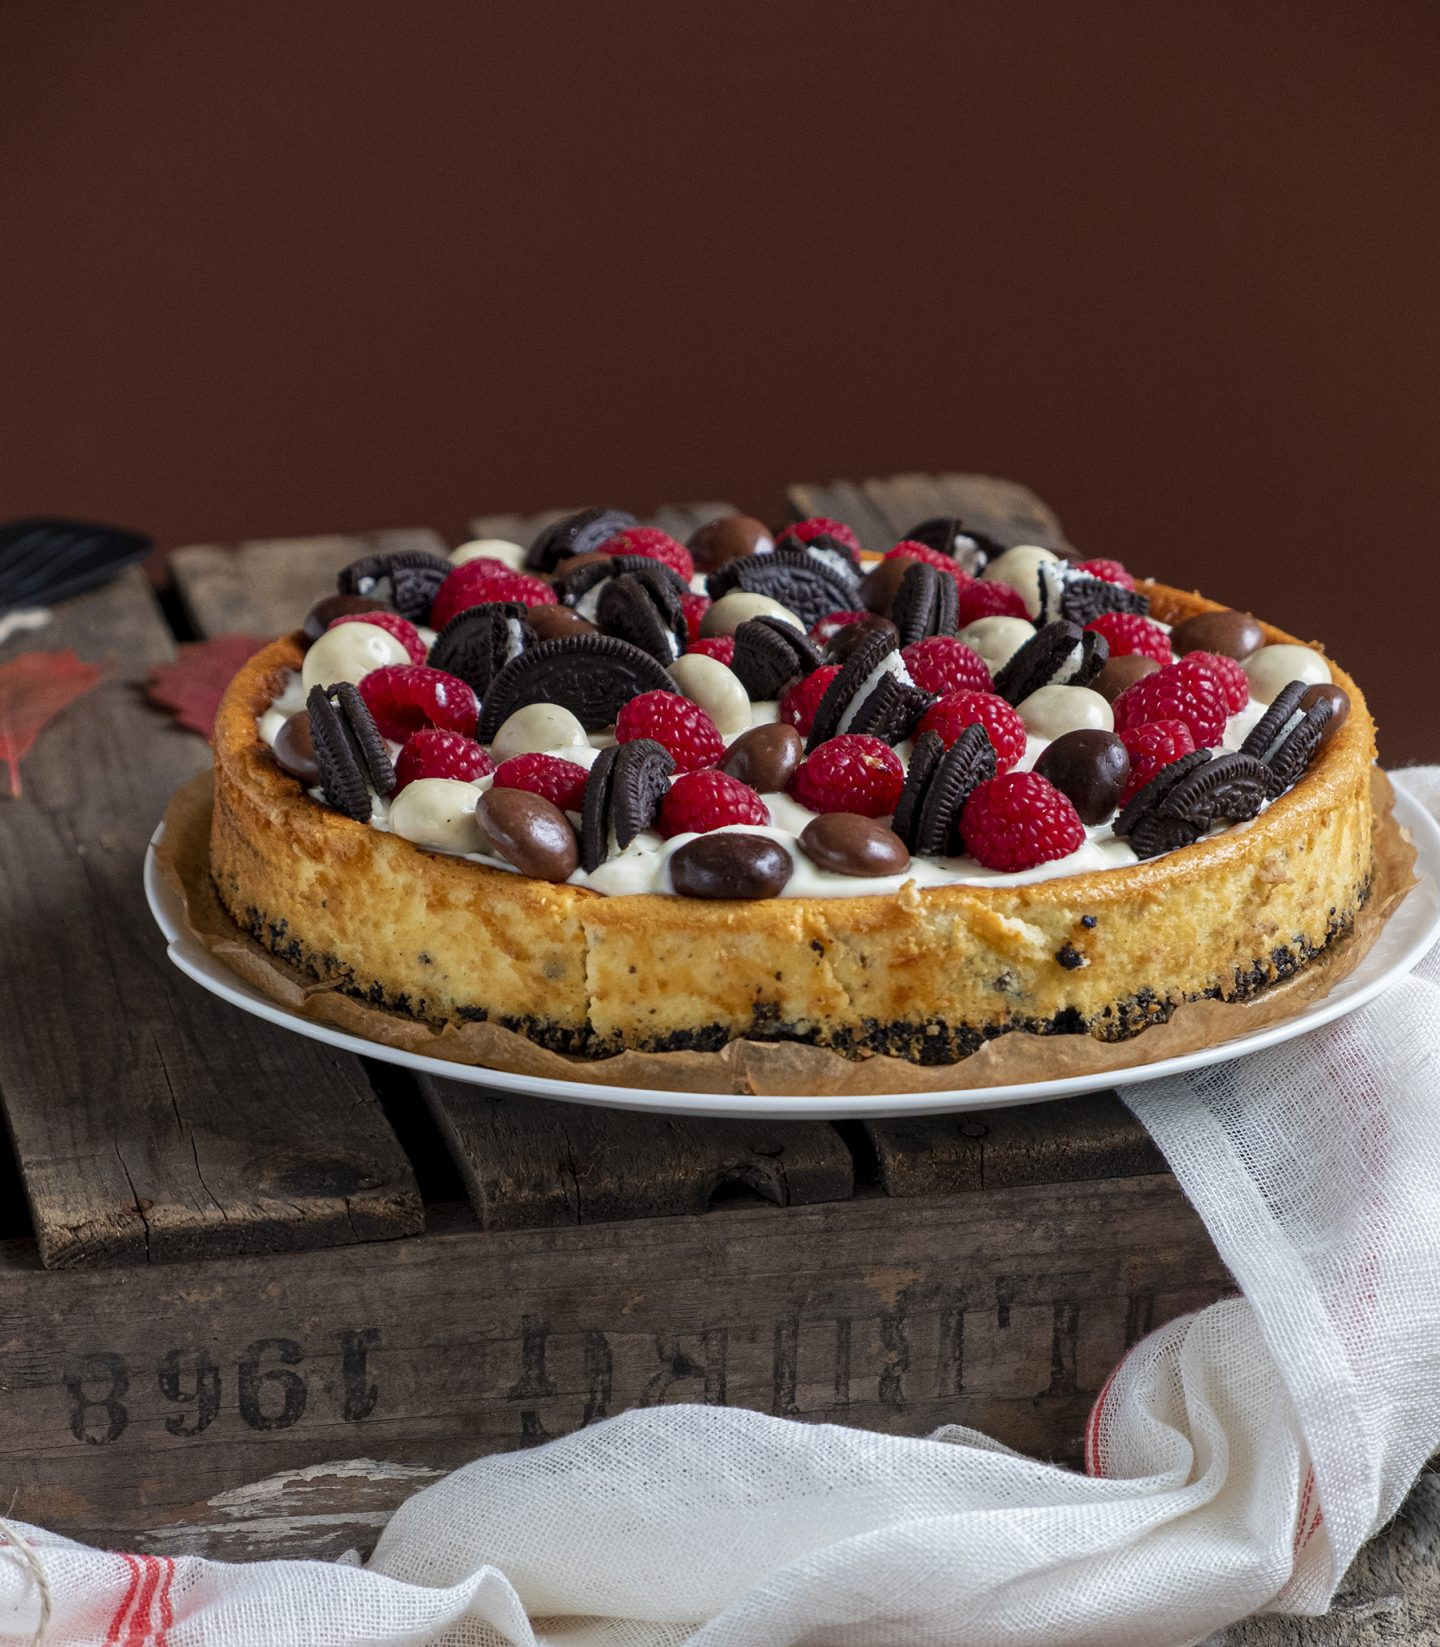 Oreo cheesecake met frambozen en pepernoten - Taarten & Cakes